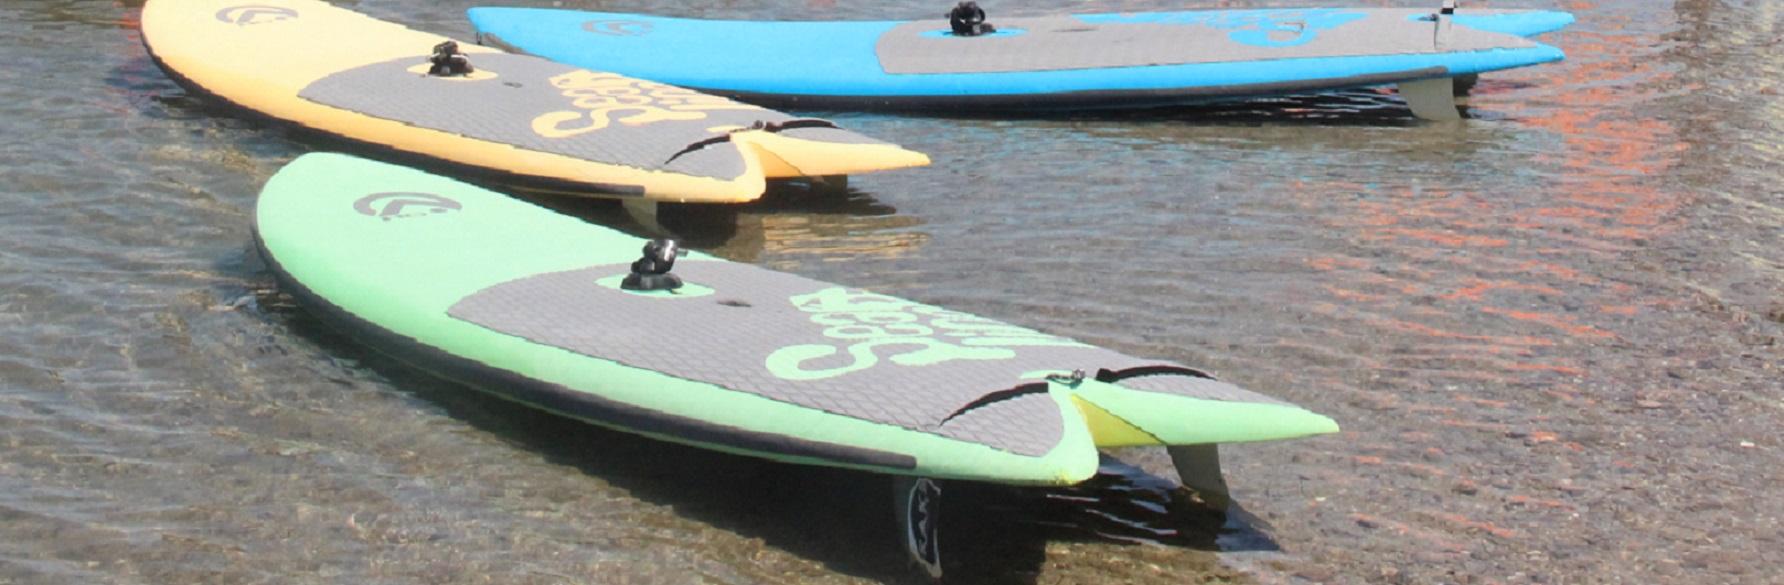 gamme windsurf et Sealion AHD en vente chez Tramontana